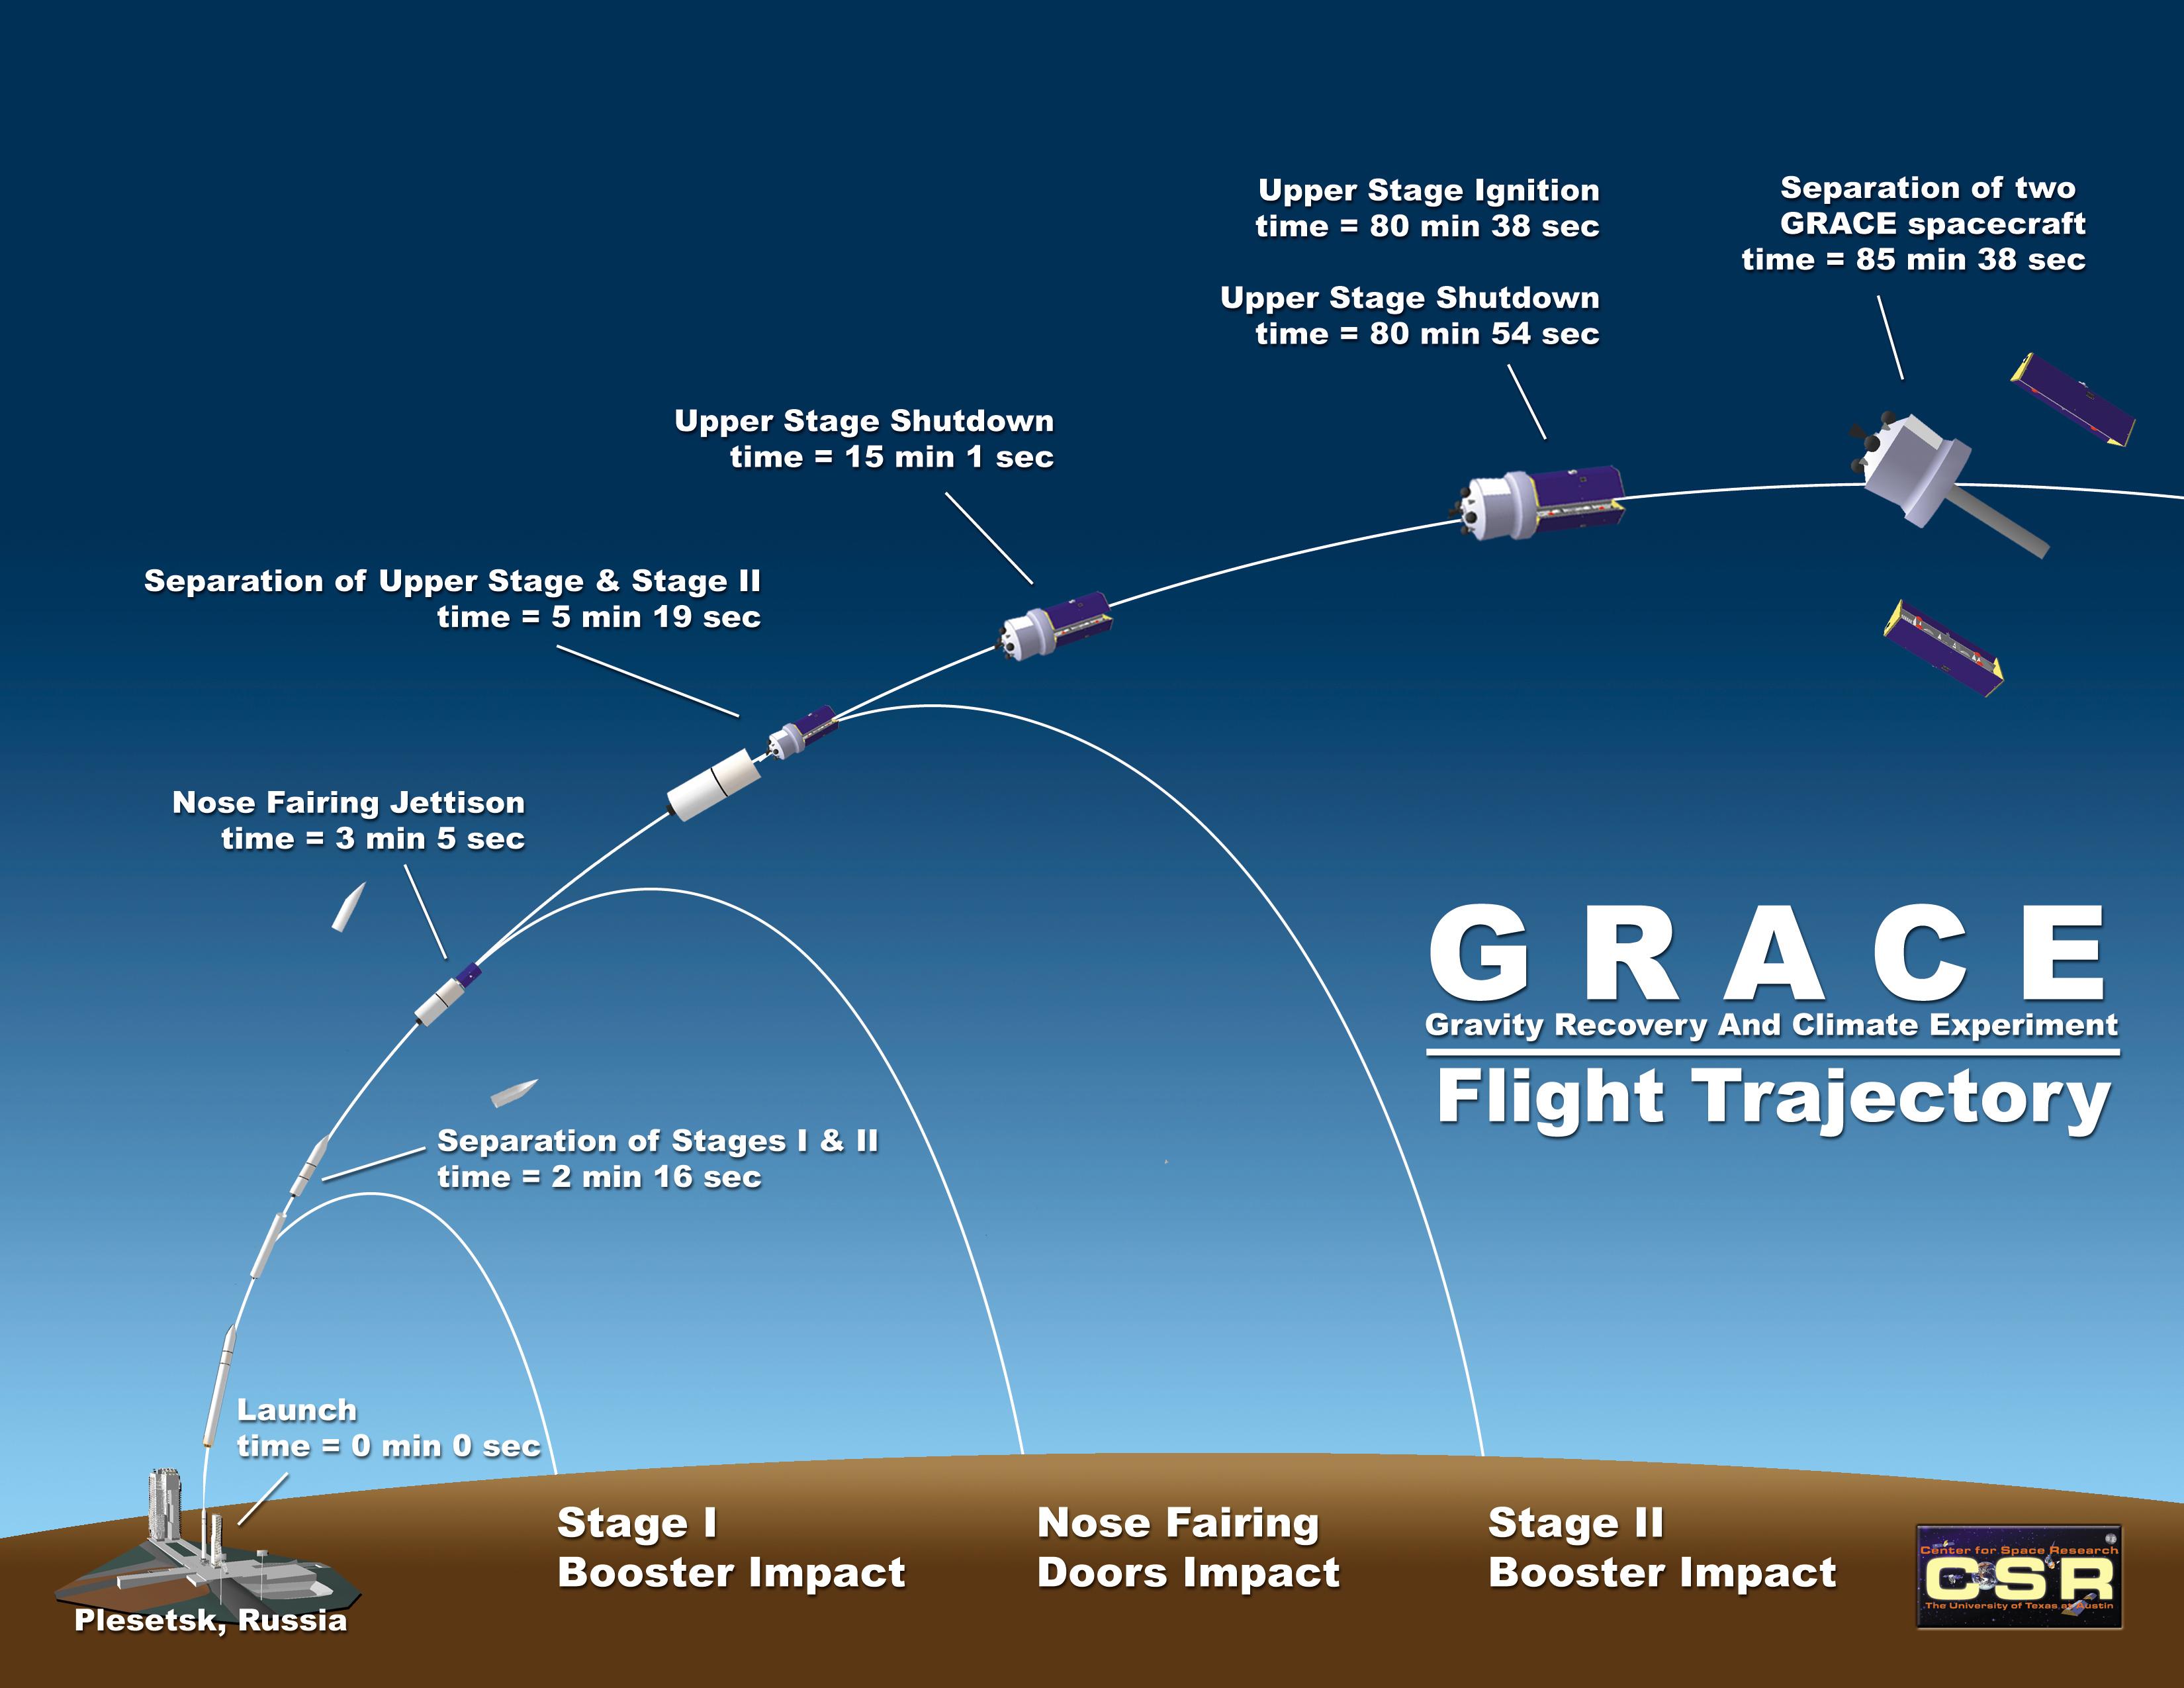 diagram for ocean grace flight trajectory grace fo  grace flight trajectory grace fo